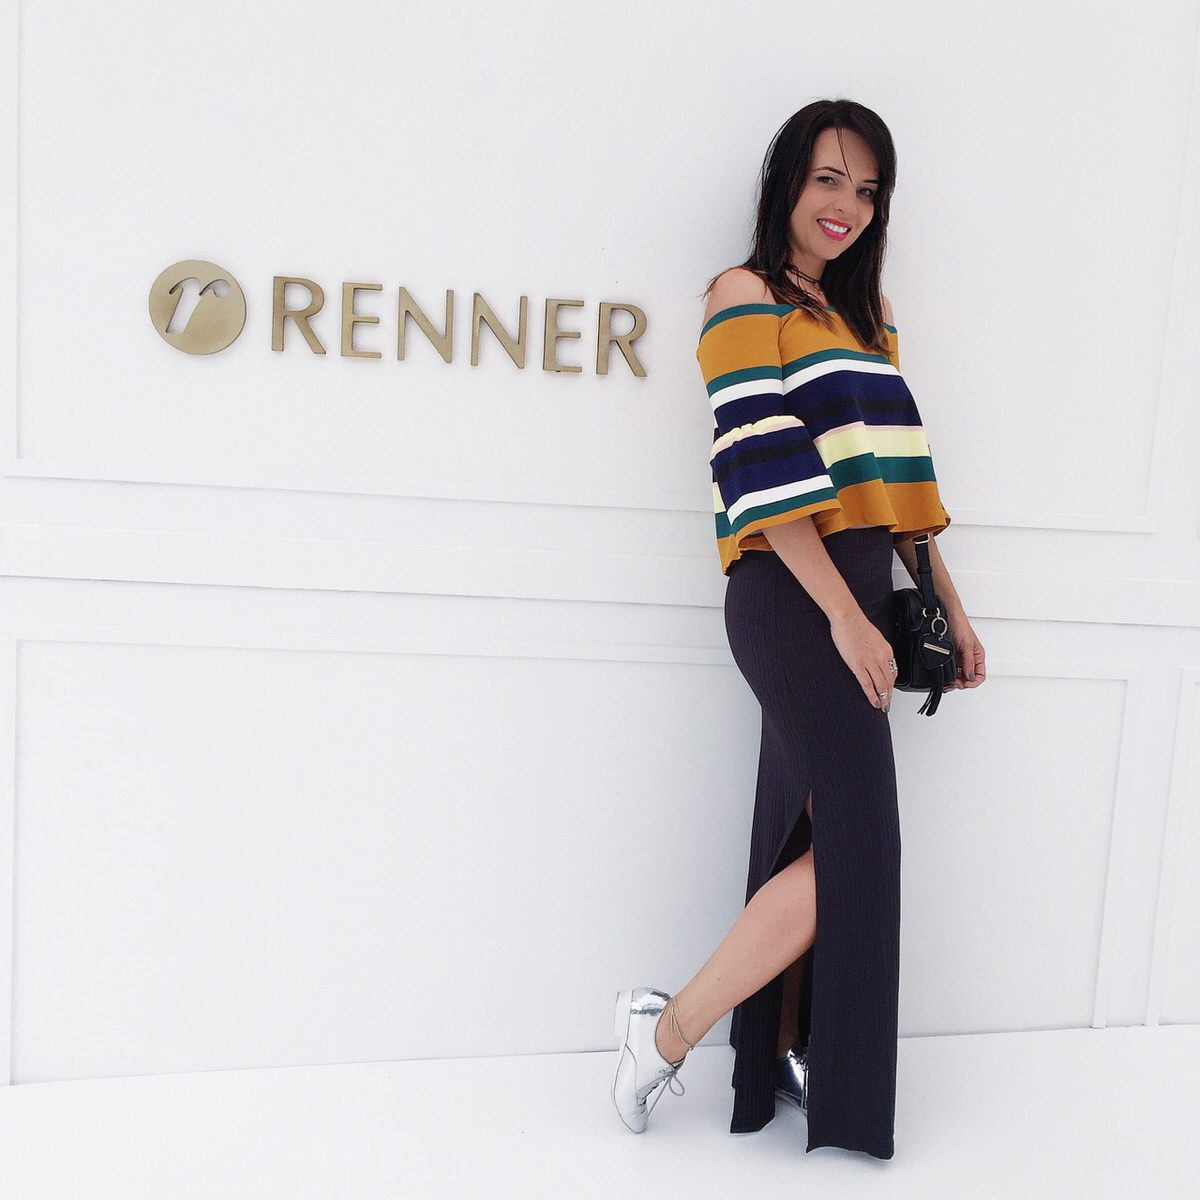 Alexandra Evangelista no Preview Renner Verão 2017, com look blusa Zara, saia Mamô e oxford Vizzano prata